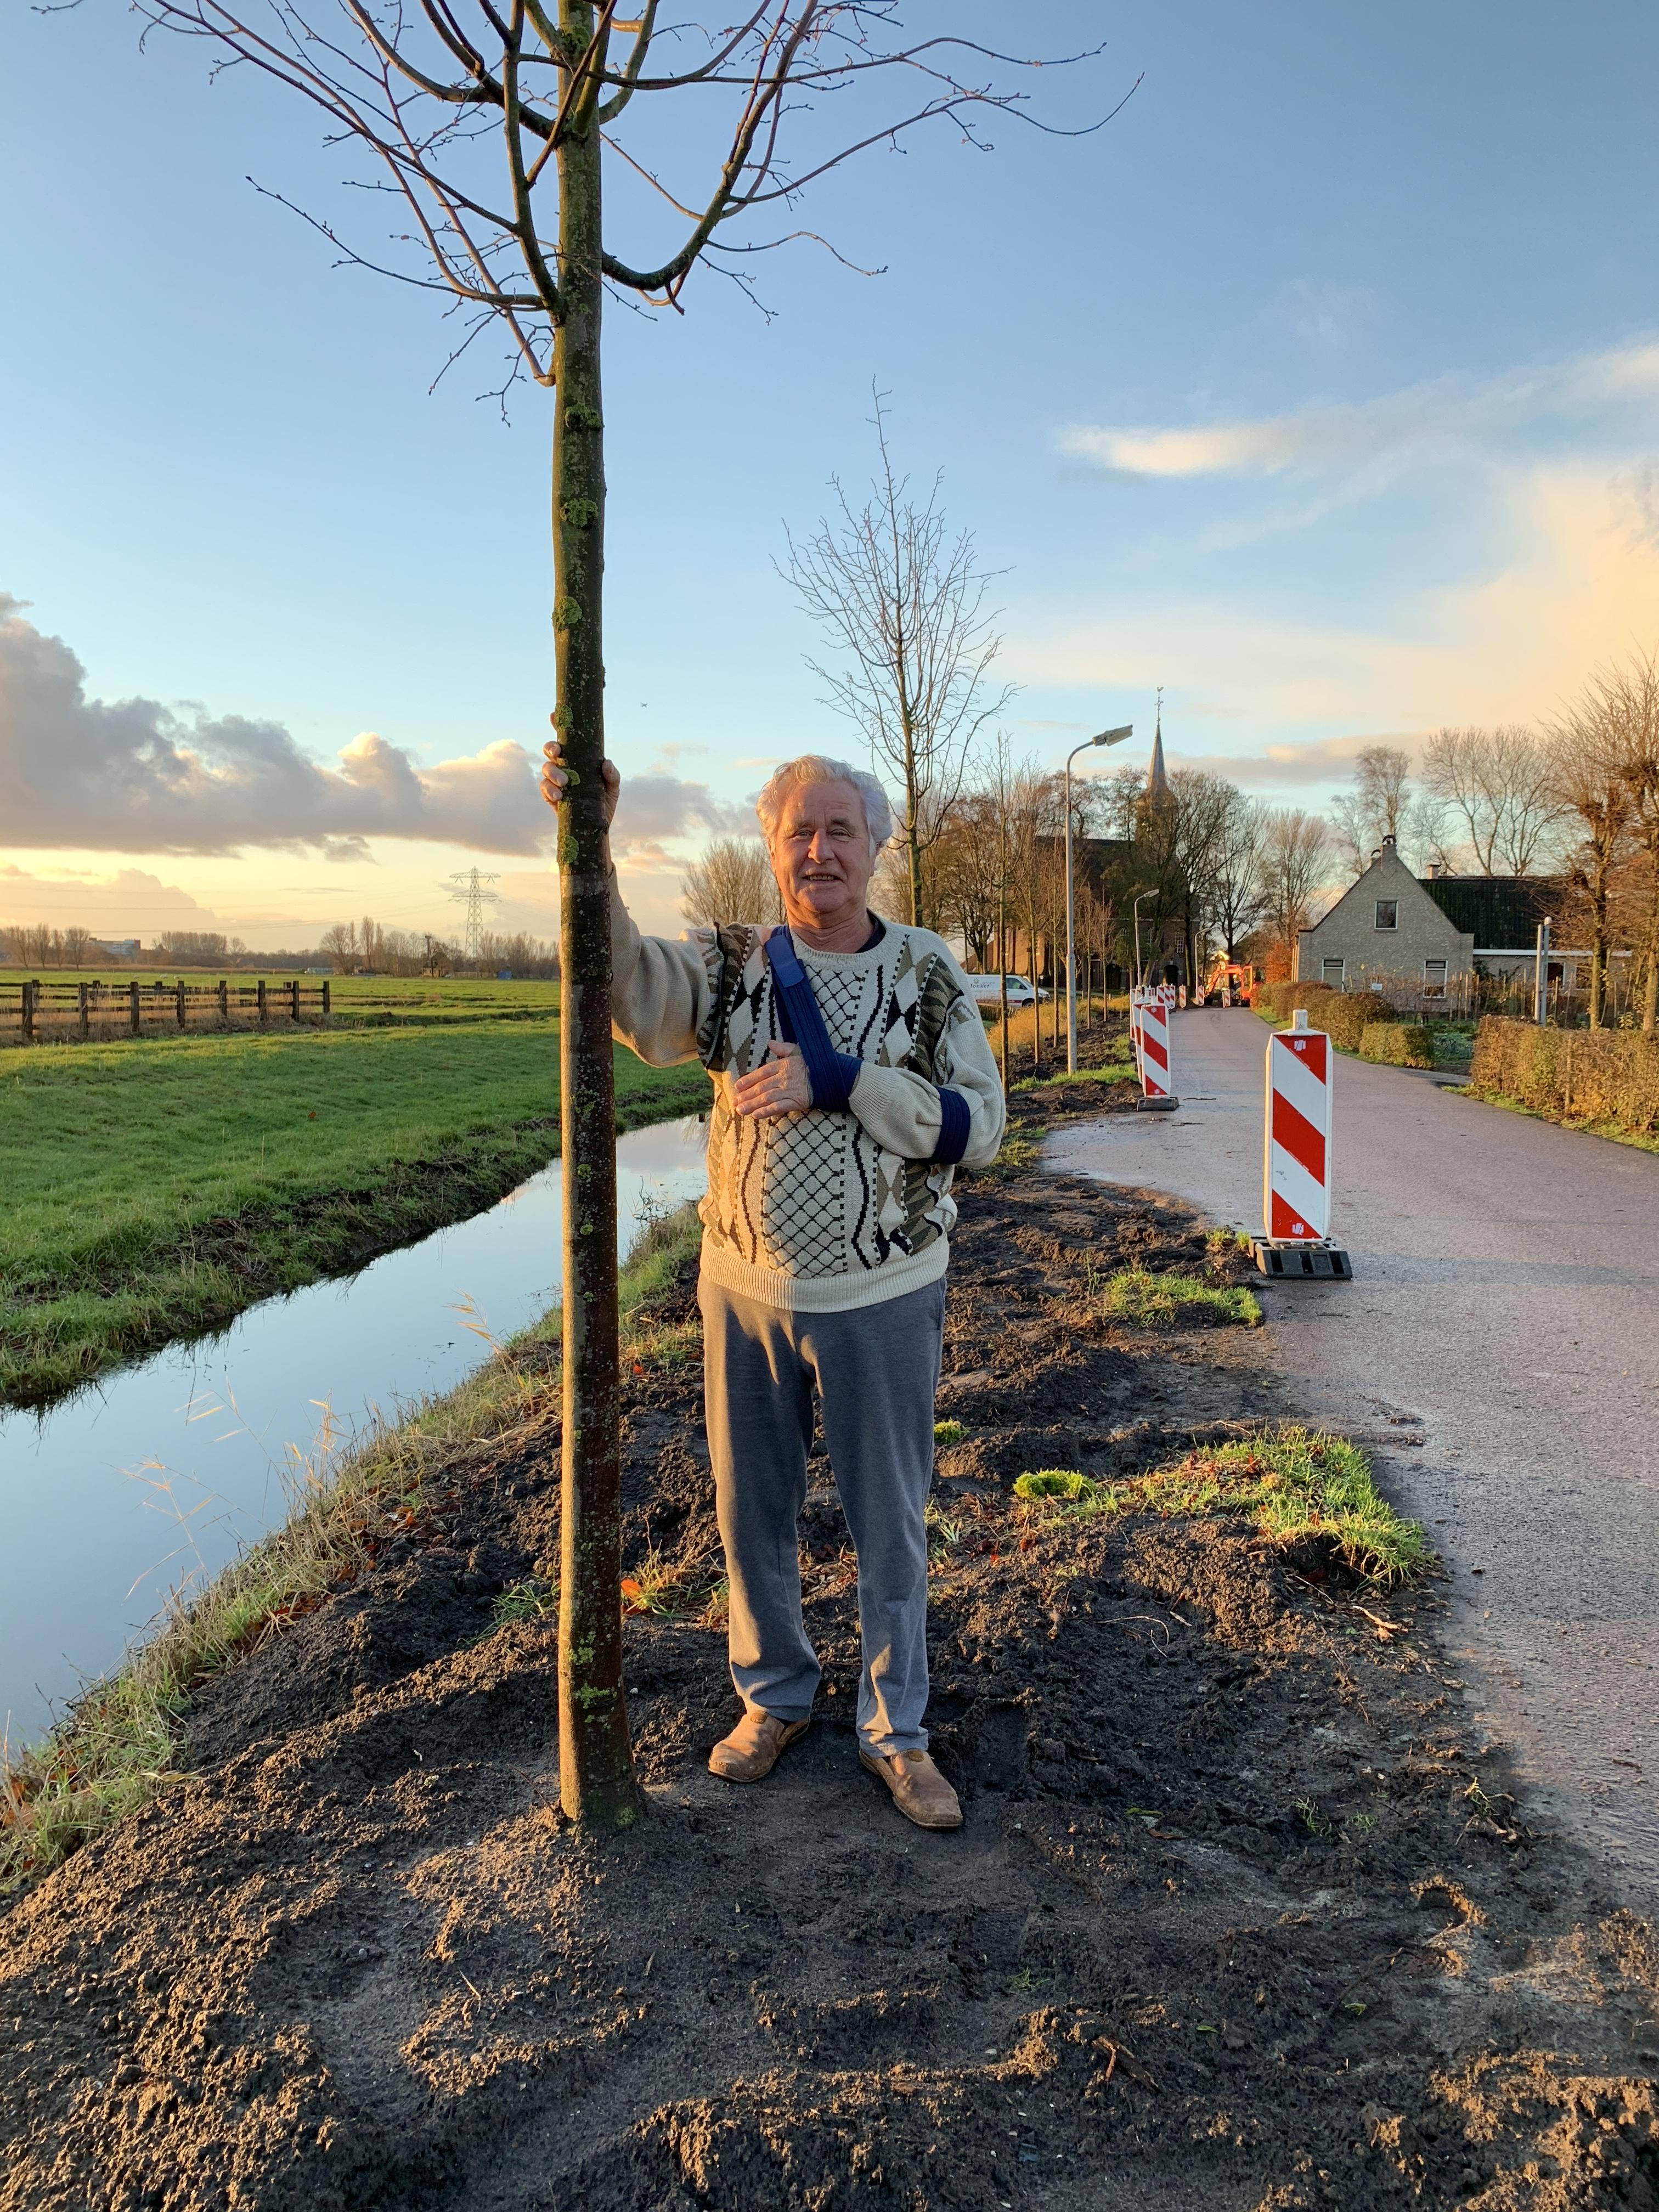 Jan Wouda bij een pas geplante lindeboom. (Foto: Yvette van der Does/Rodi Media)